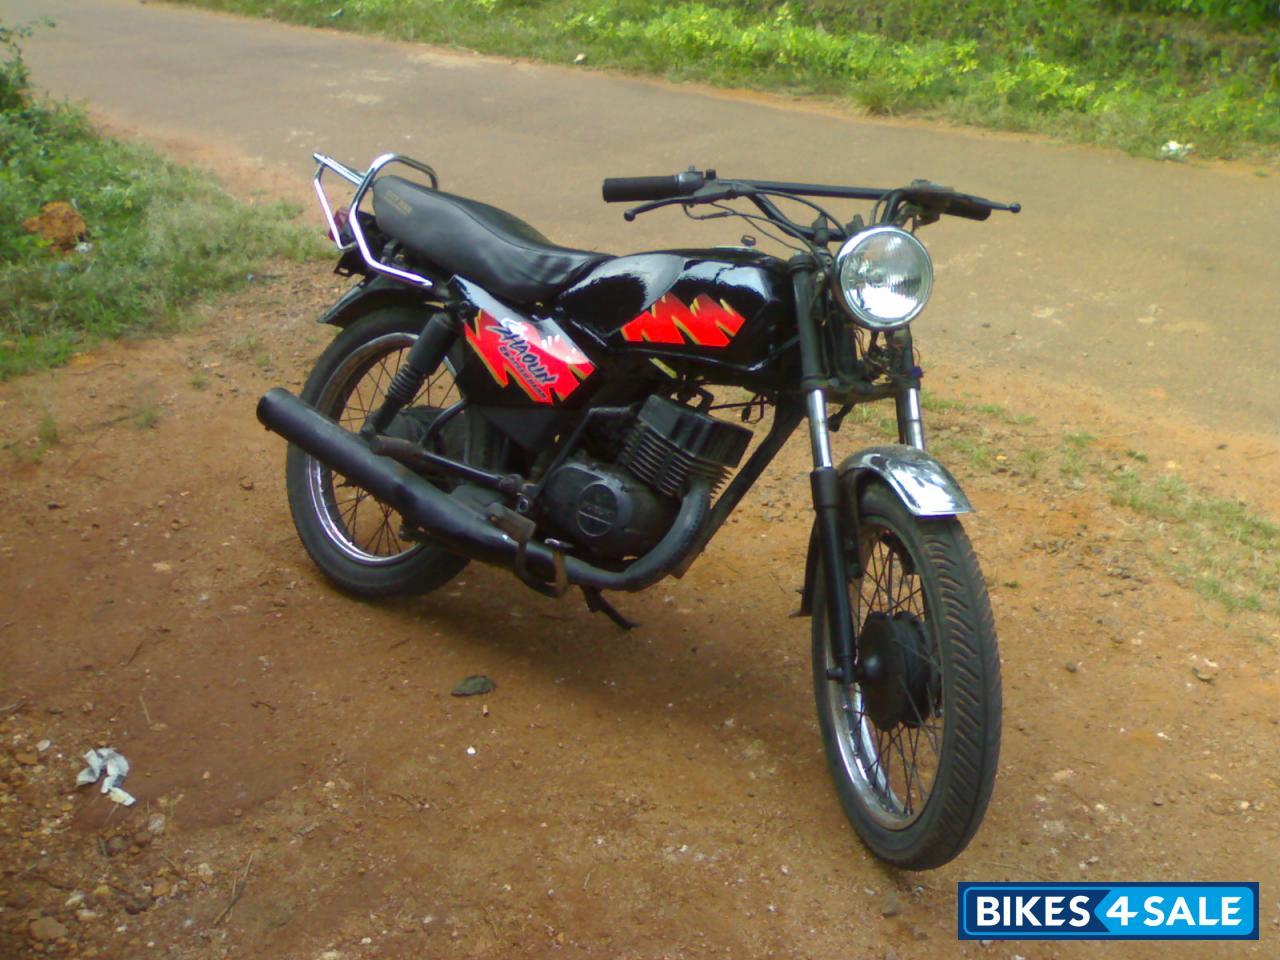 Suzuki Samurai Bike For Sale In Kerala